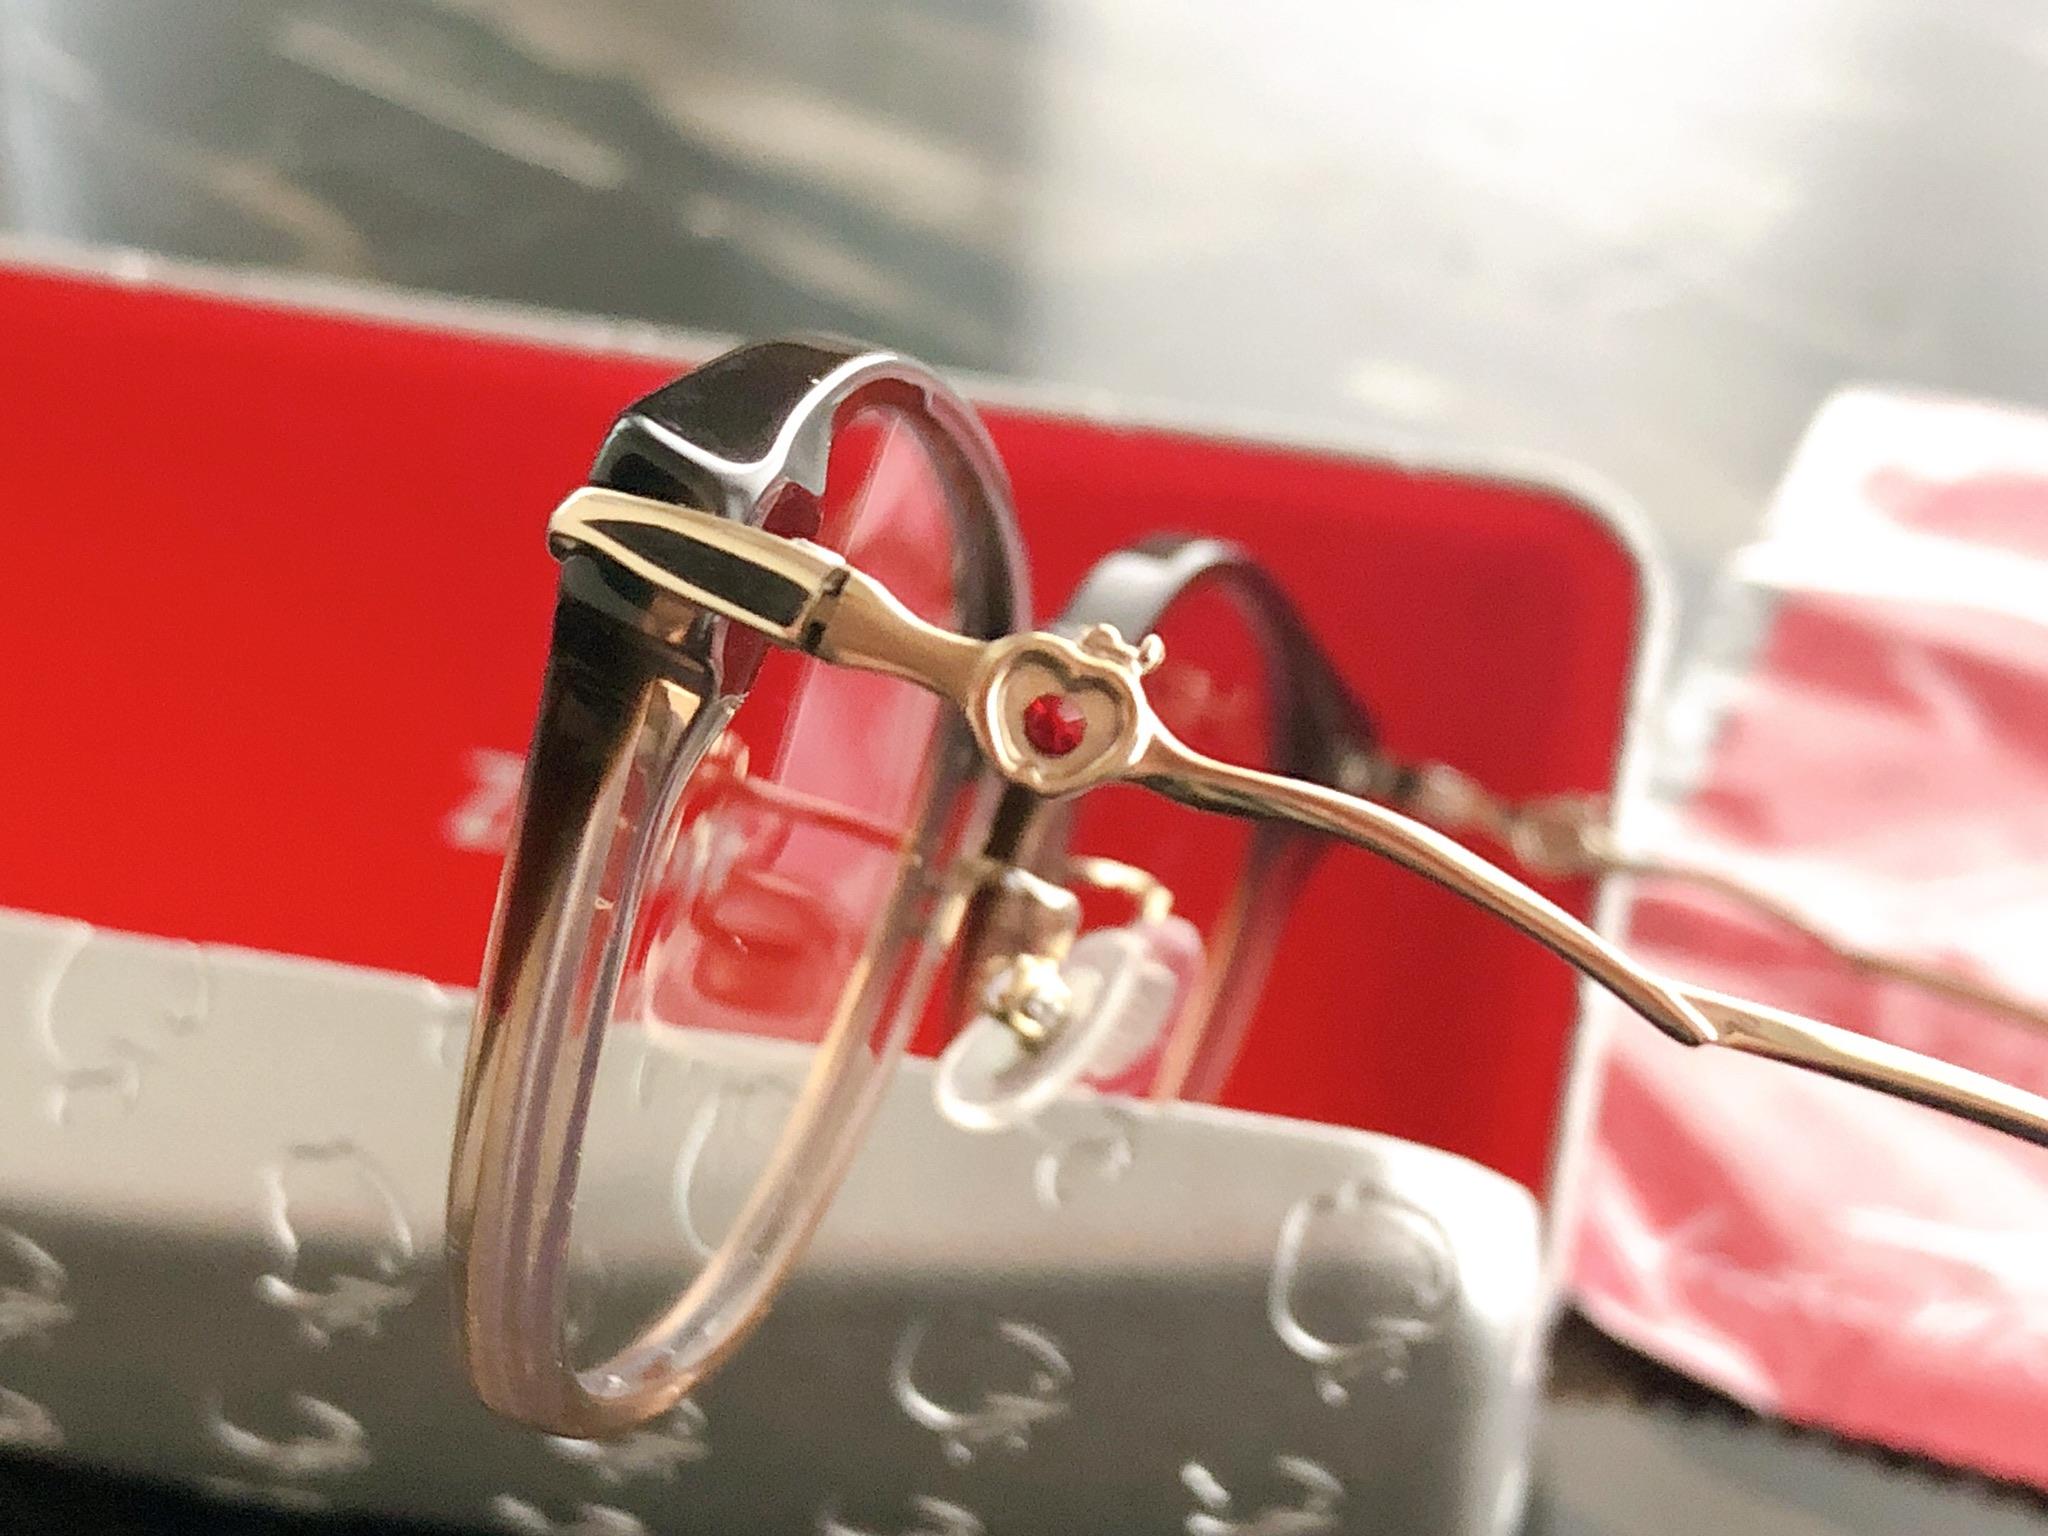 【Zoff】アクセサリーみたいな可愛さ♡ディズニープリンセスのメガネに一目惚れ(๑>◡<๑)! ブルーライトカット仕様は追加料金0円!_2